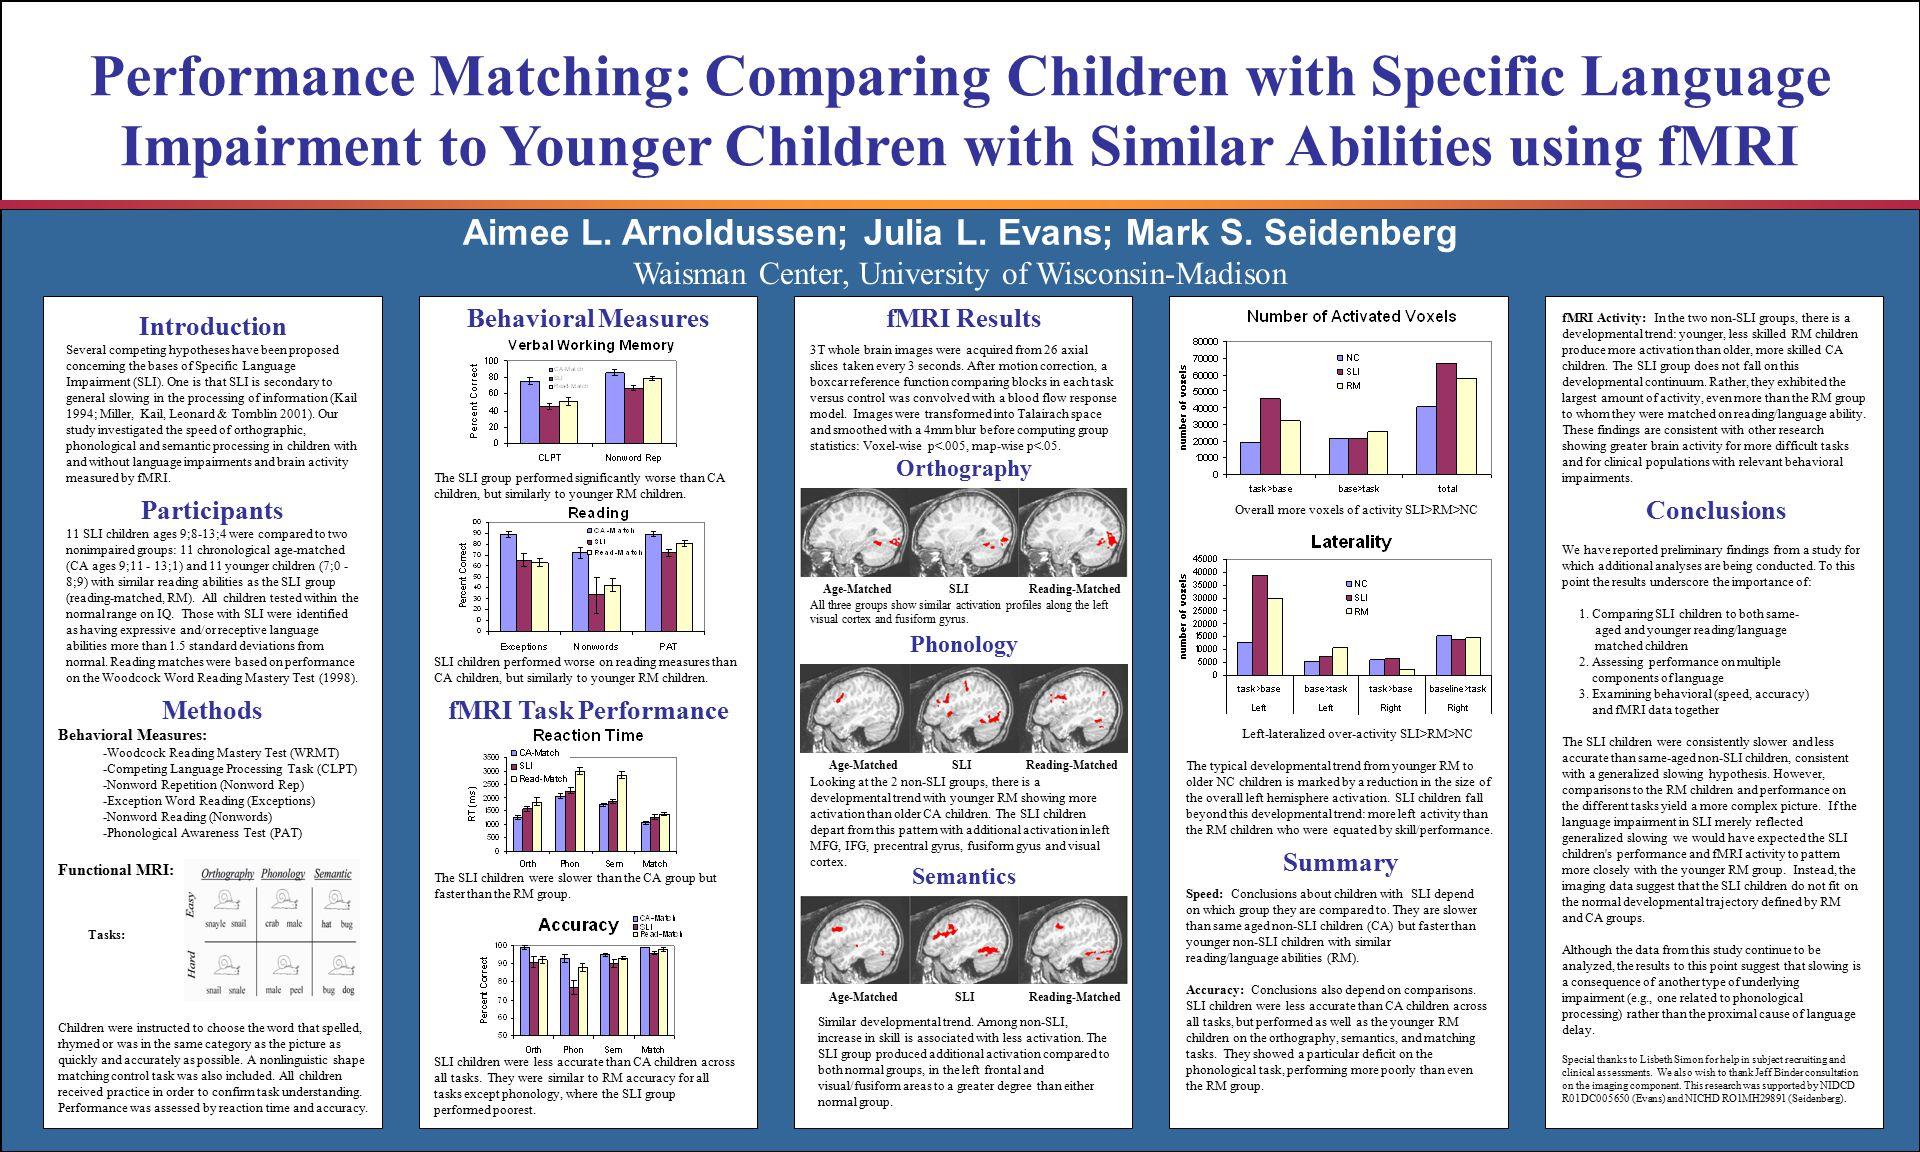 Aimee L. Arnoldussen; Julia L. Evans; Mark S. Seidenberg Performance Matching: Comparing Children with Specific Language Impairment to Younger Childre